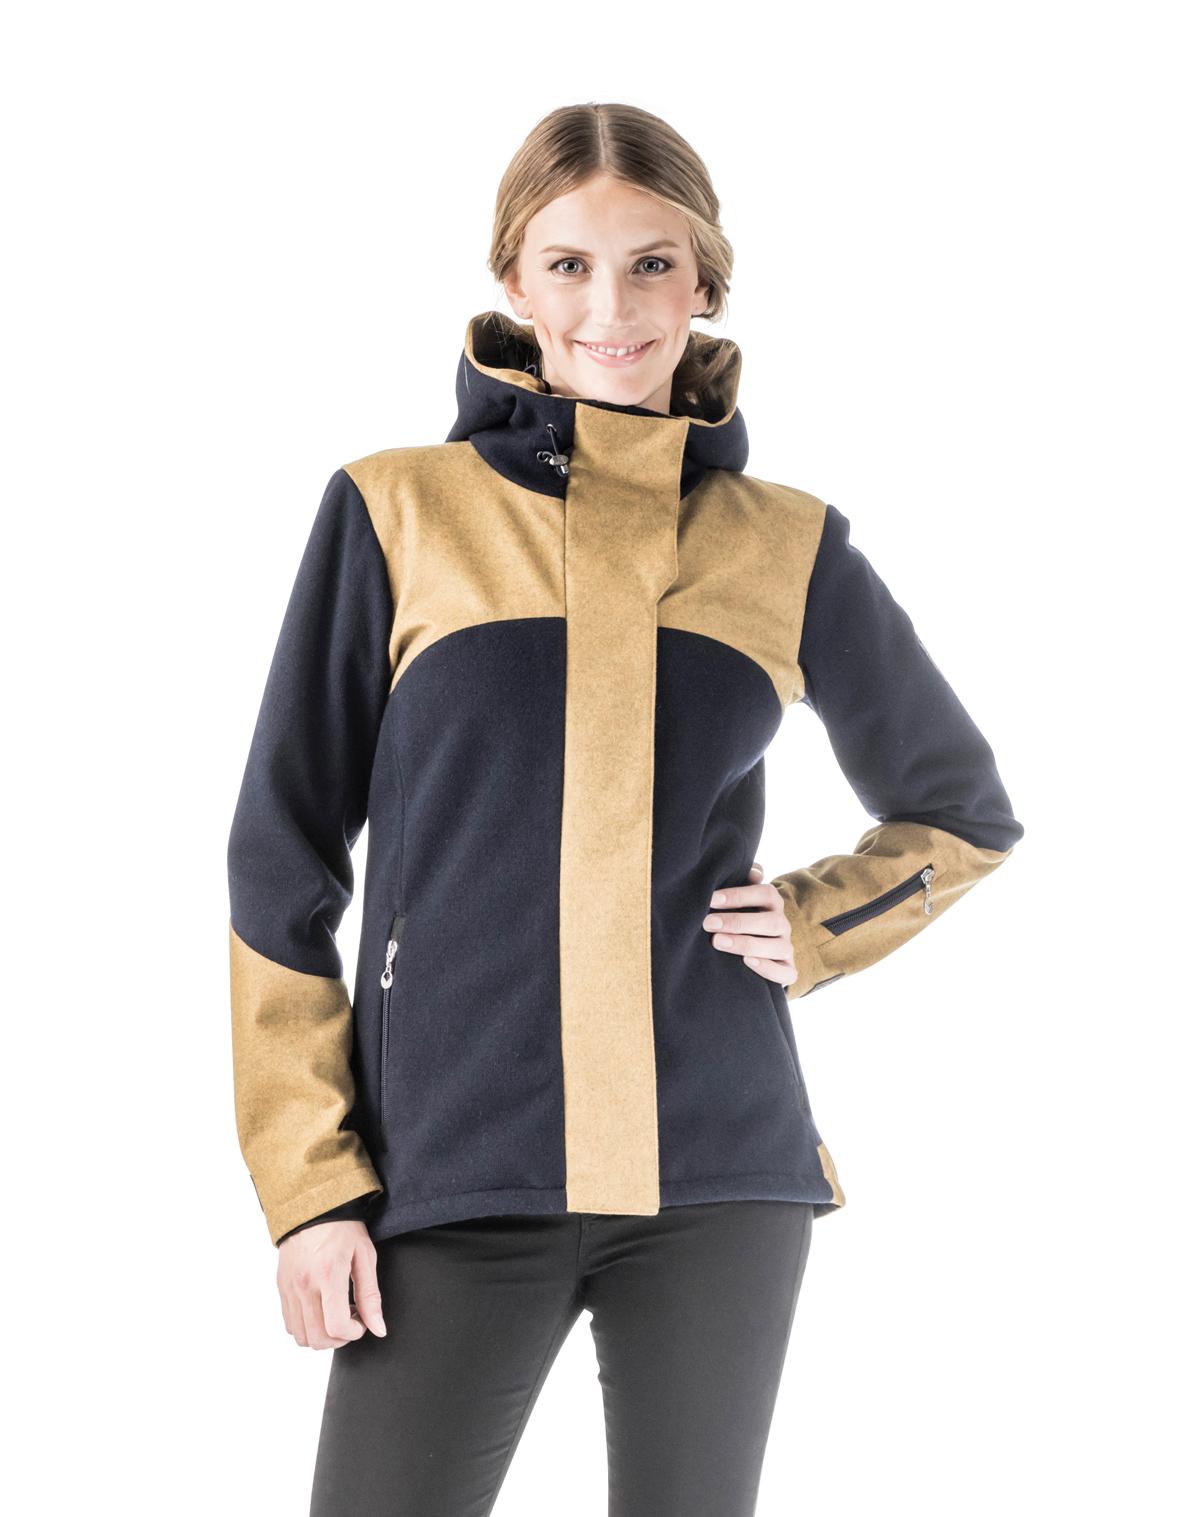 stryn women The weatherproof outerwear collection offers men's and women's norewegian wool jackets and sweaters that are windproof stryn feminine knitshell jacket.